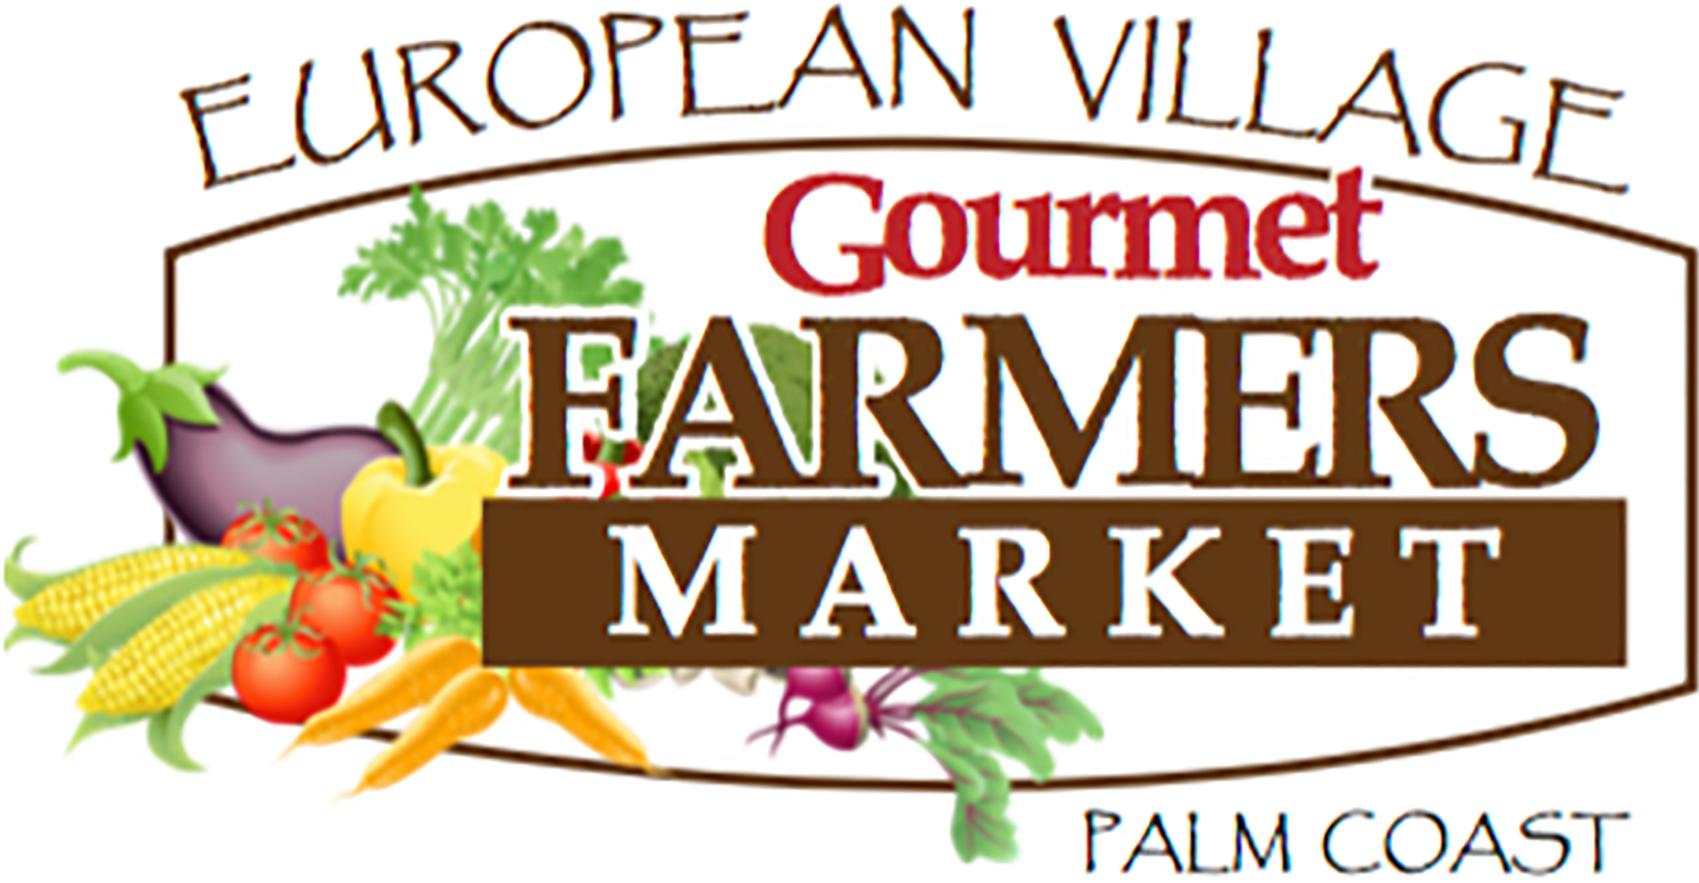 Gourmet Farmers Market at The European Village logo